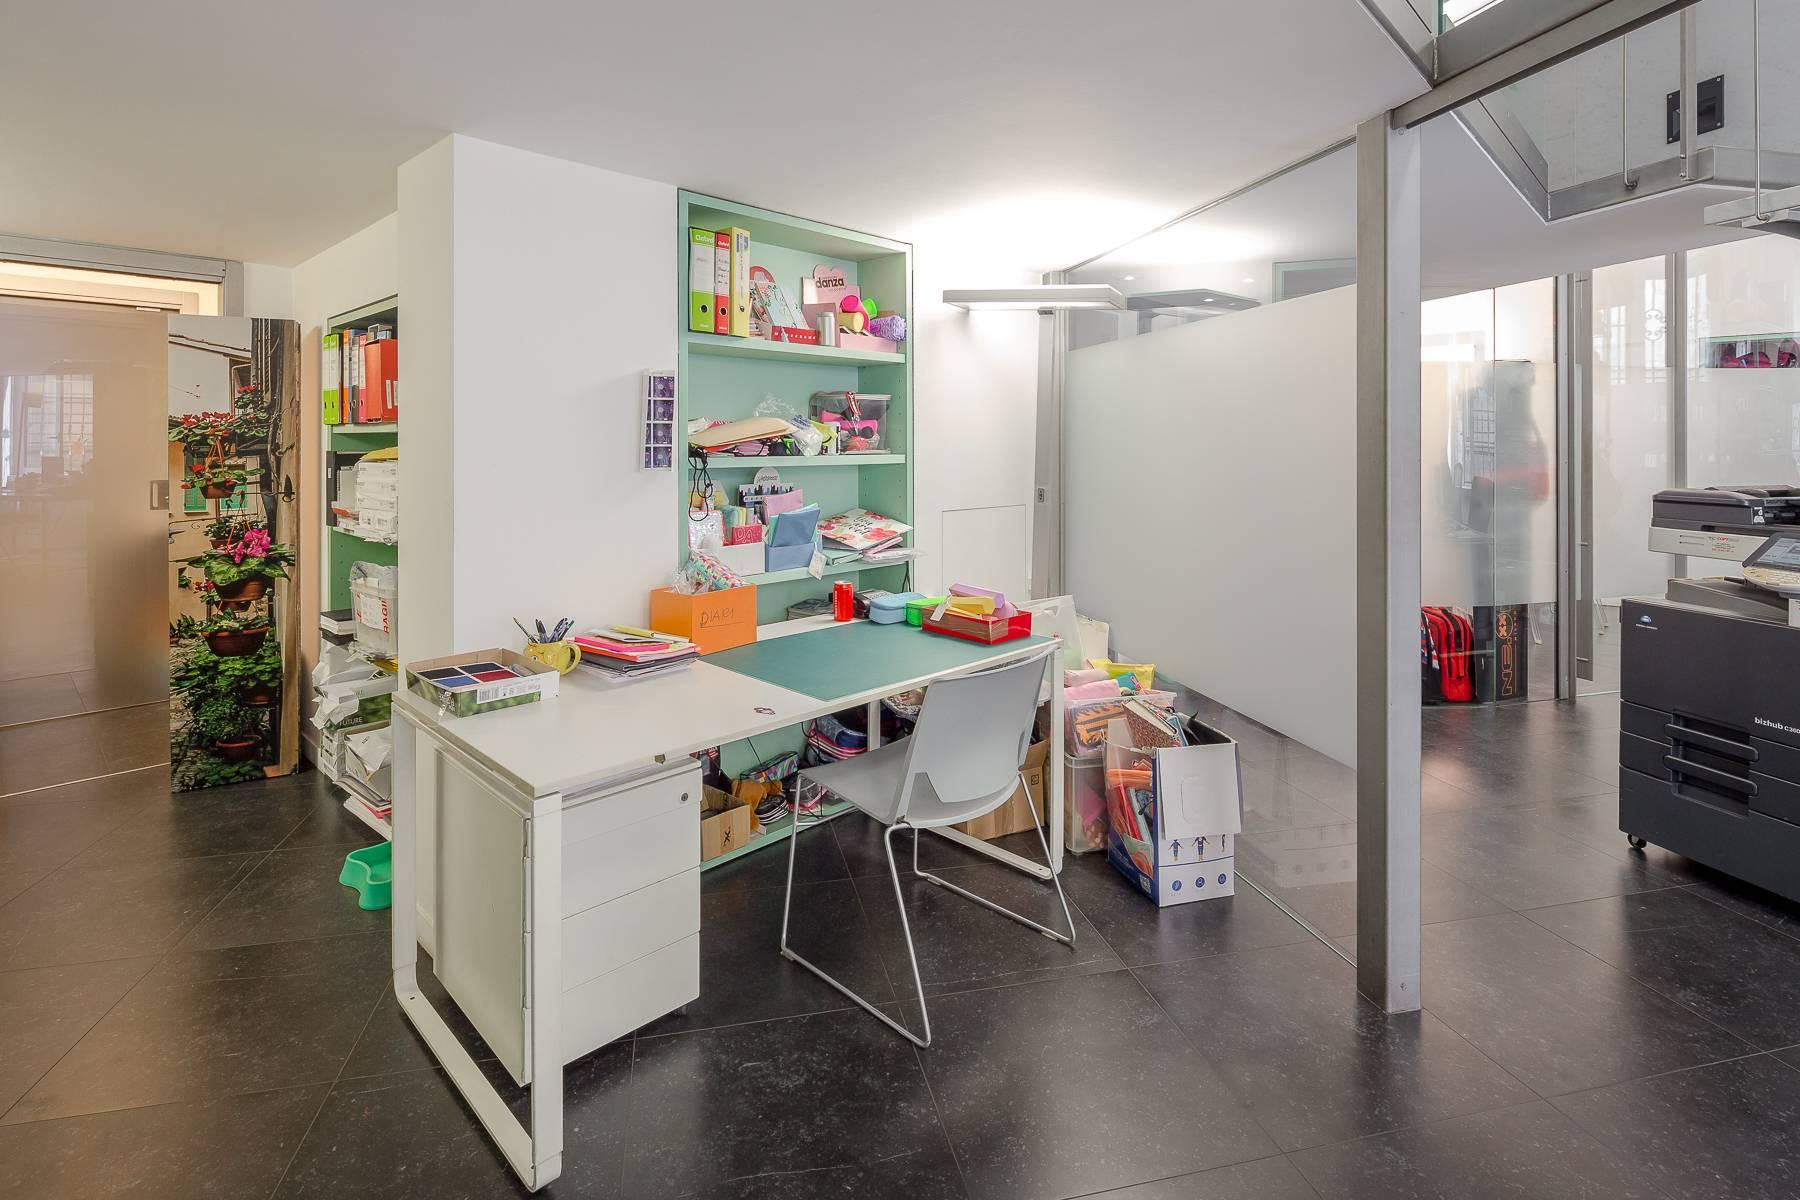 Opne-Space Büro / Wohnimmobilie auf der Piazza Giovine Italia / Via Aurelio Saffi - 11